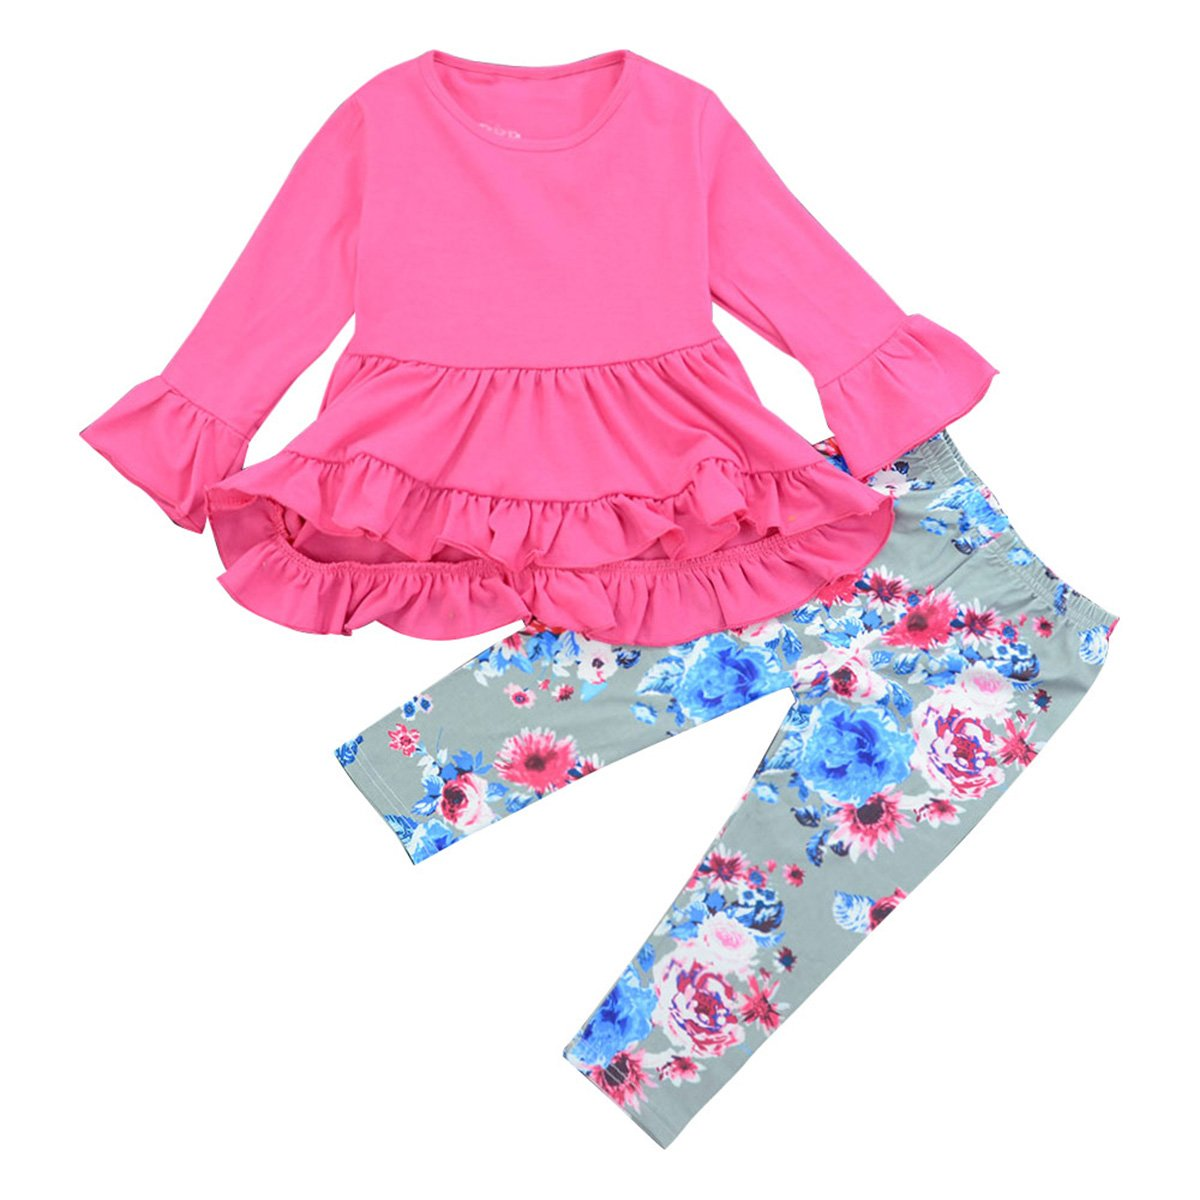 Borlai 1-6T Toddler Girl Ruffle Shirt Irregular Hem Tops+Floral Capris Trousers Outfits